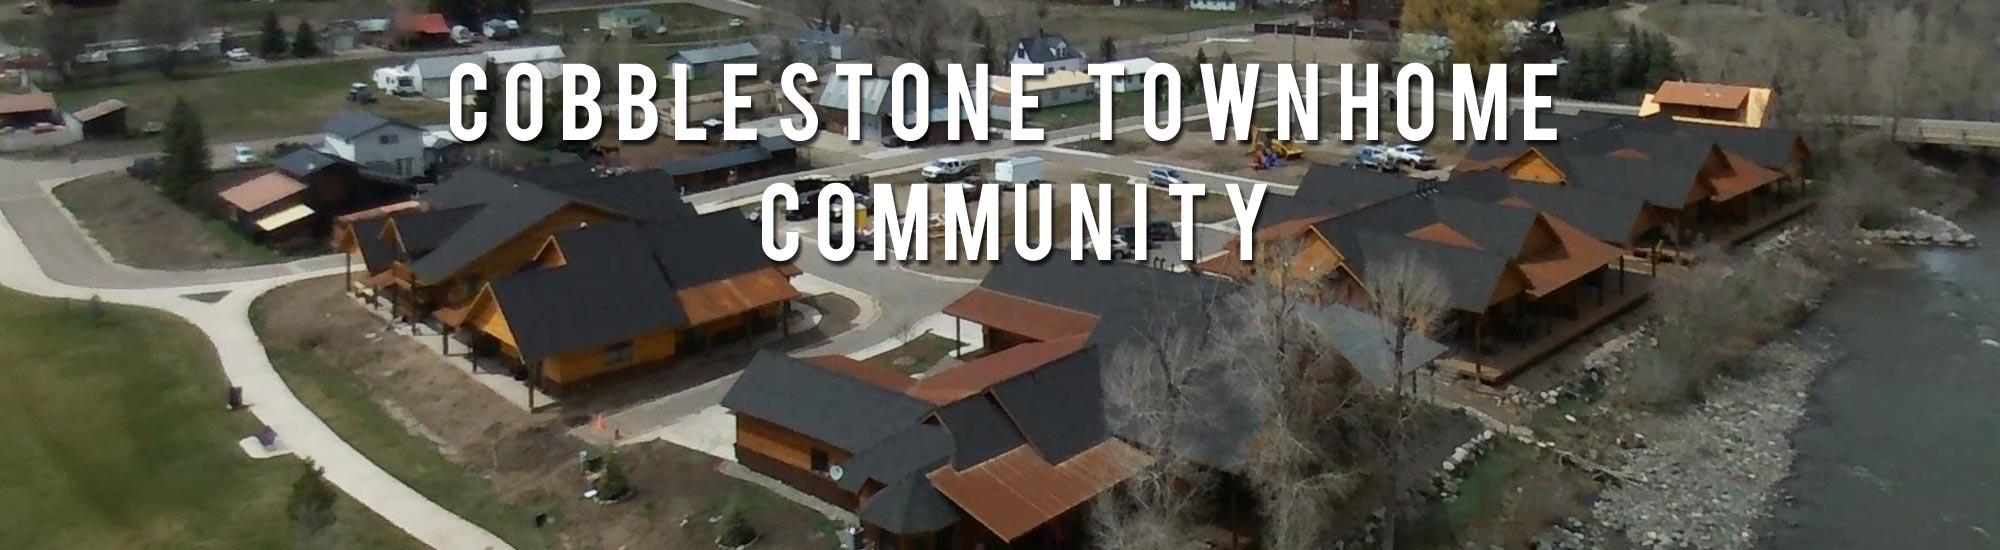 Cobblestone Townhome Community in Pagosa Springs Colorado